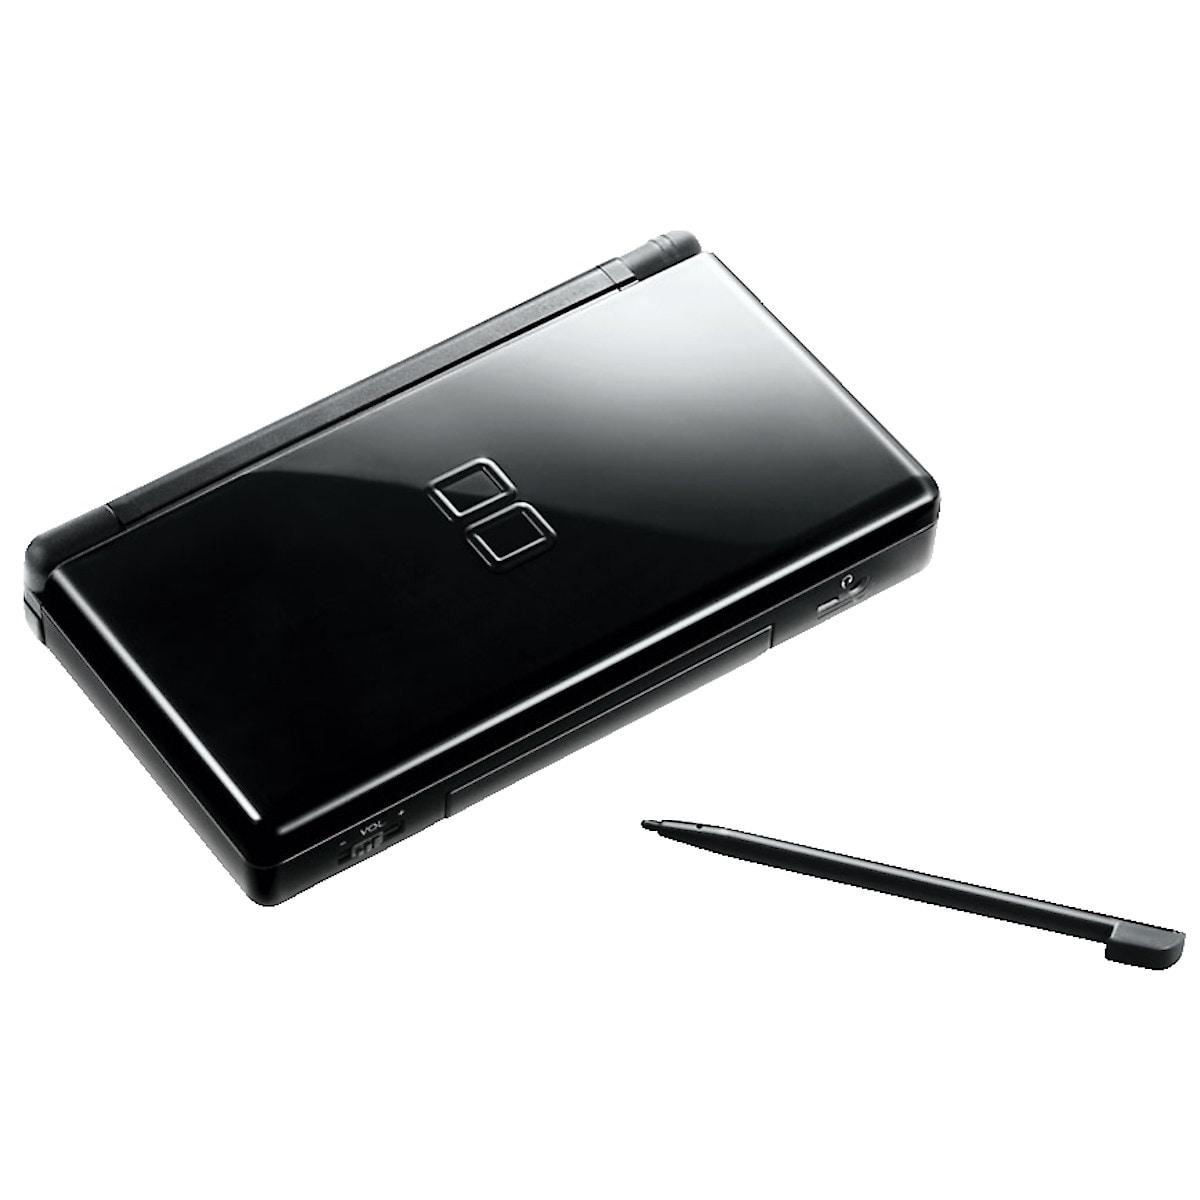 Nintendo DS™ Lite